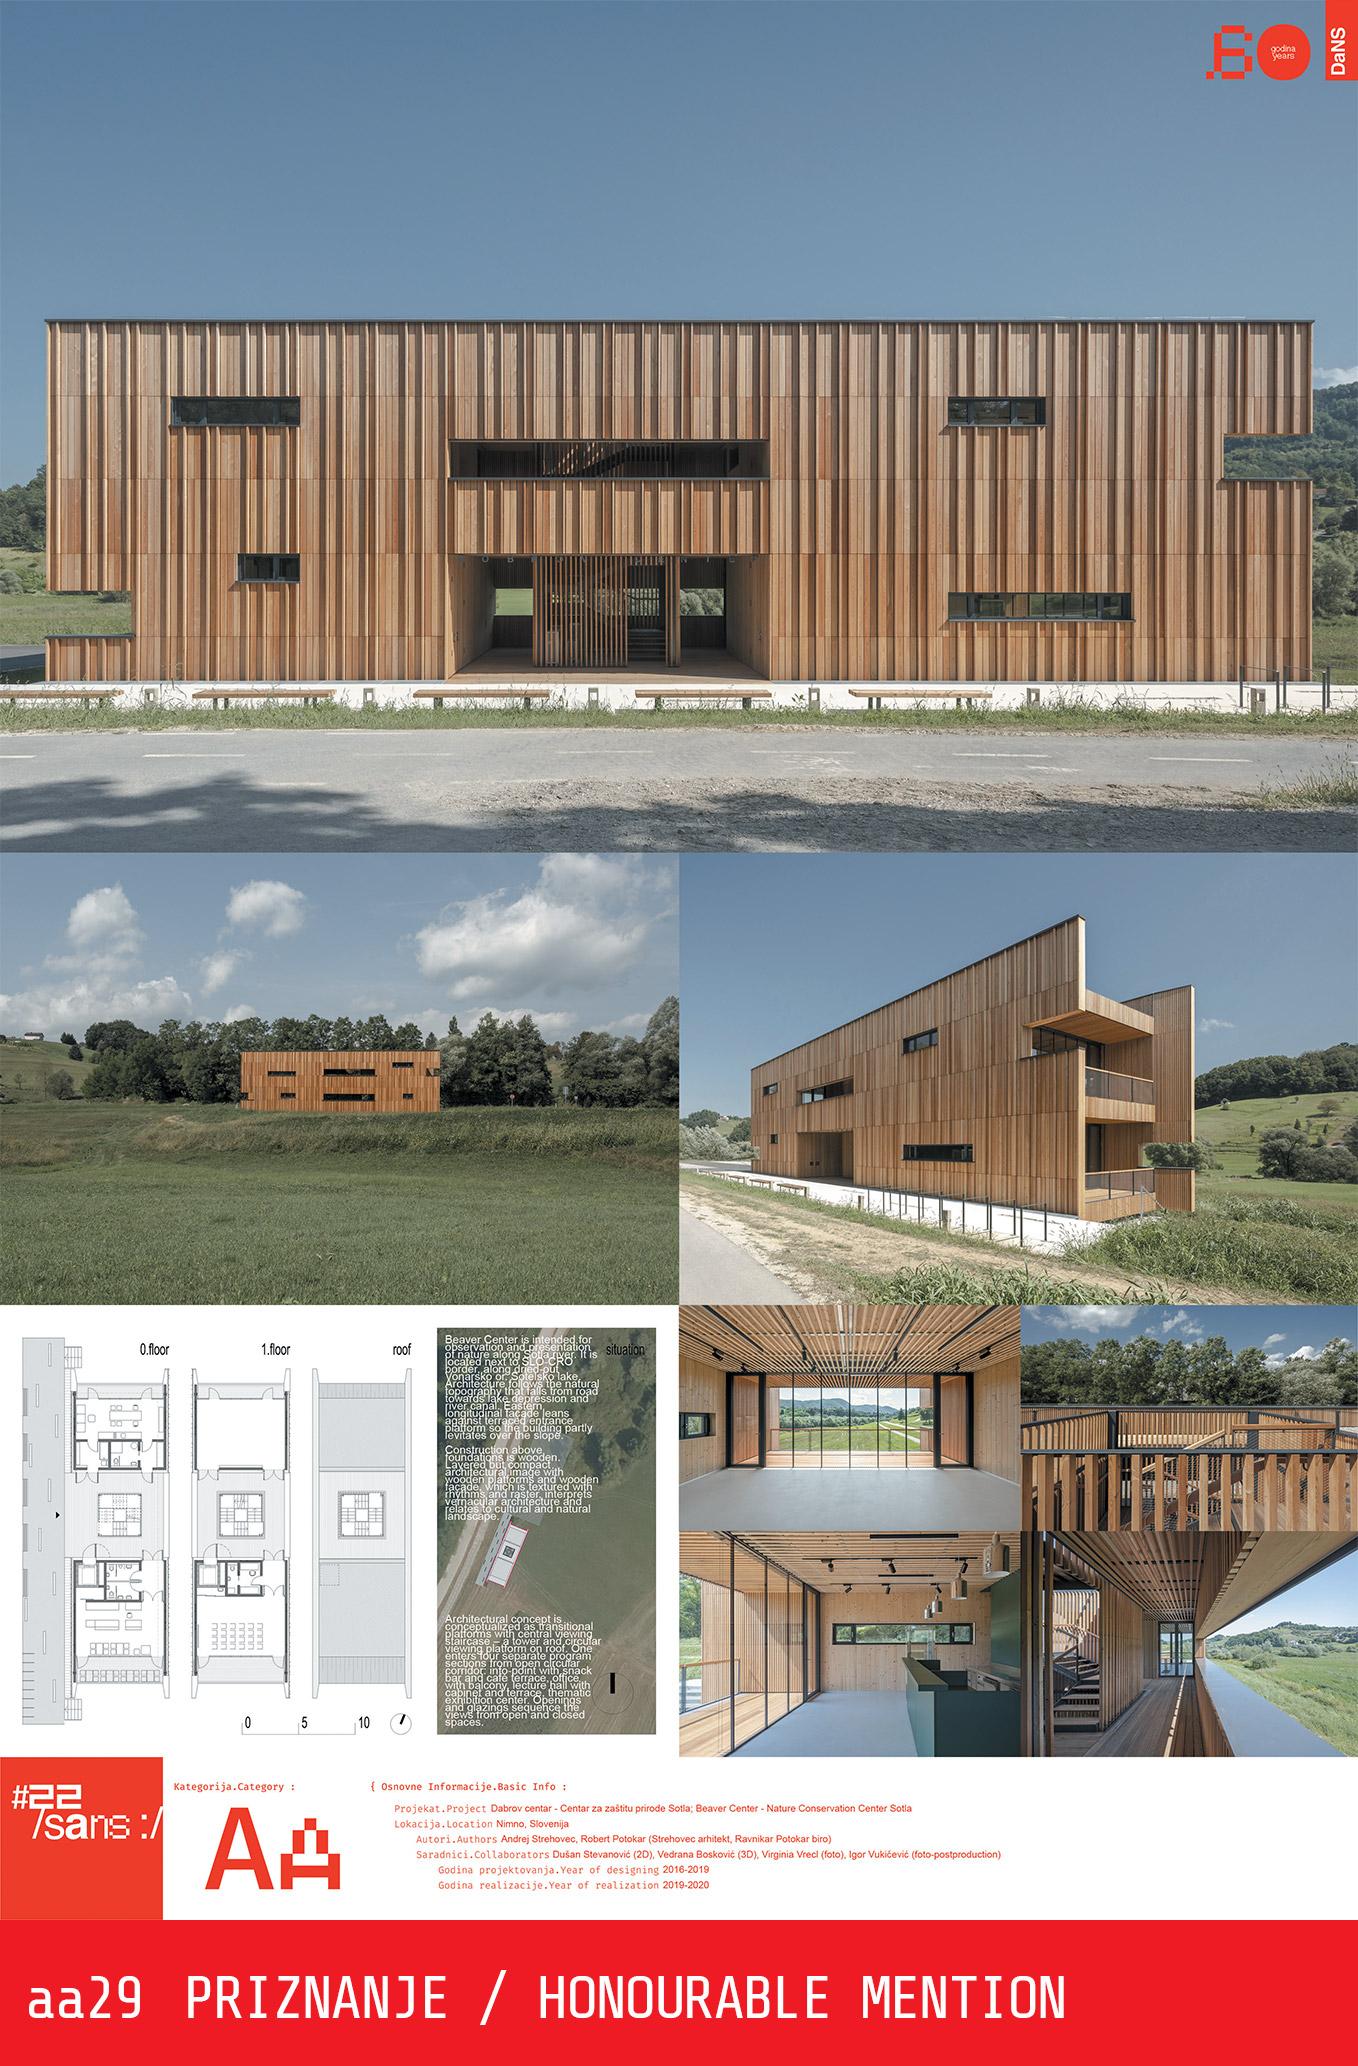 "<p class=""naslov-br"">aa29</p>Dabrov centar (Centar za zaštitu prirode Sotla) // Beaver Center (Nature Conservation Center Sotla)"